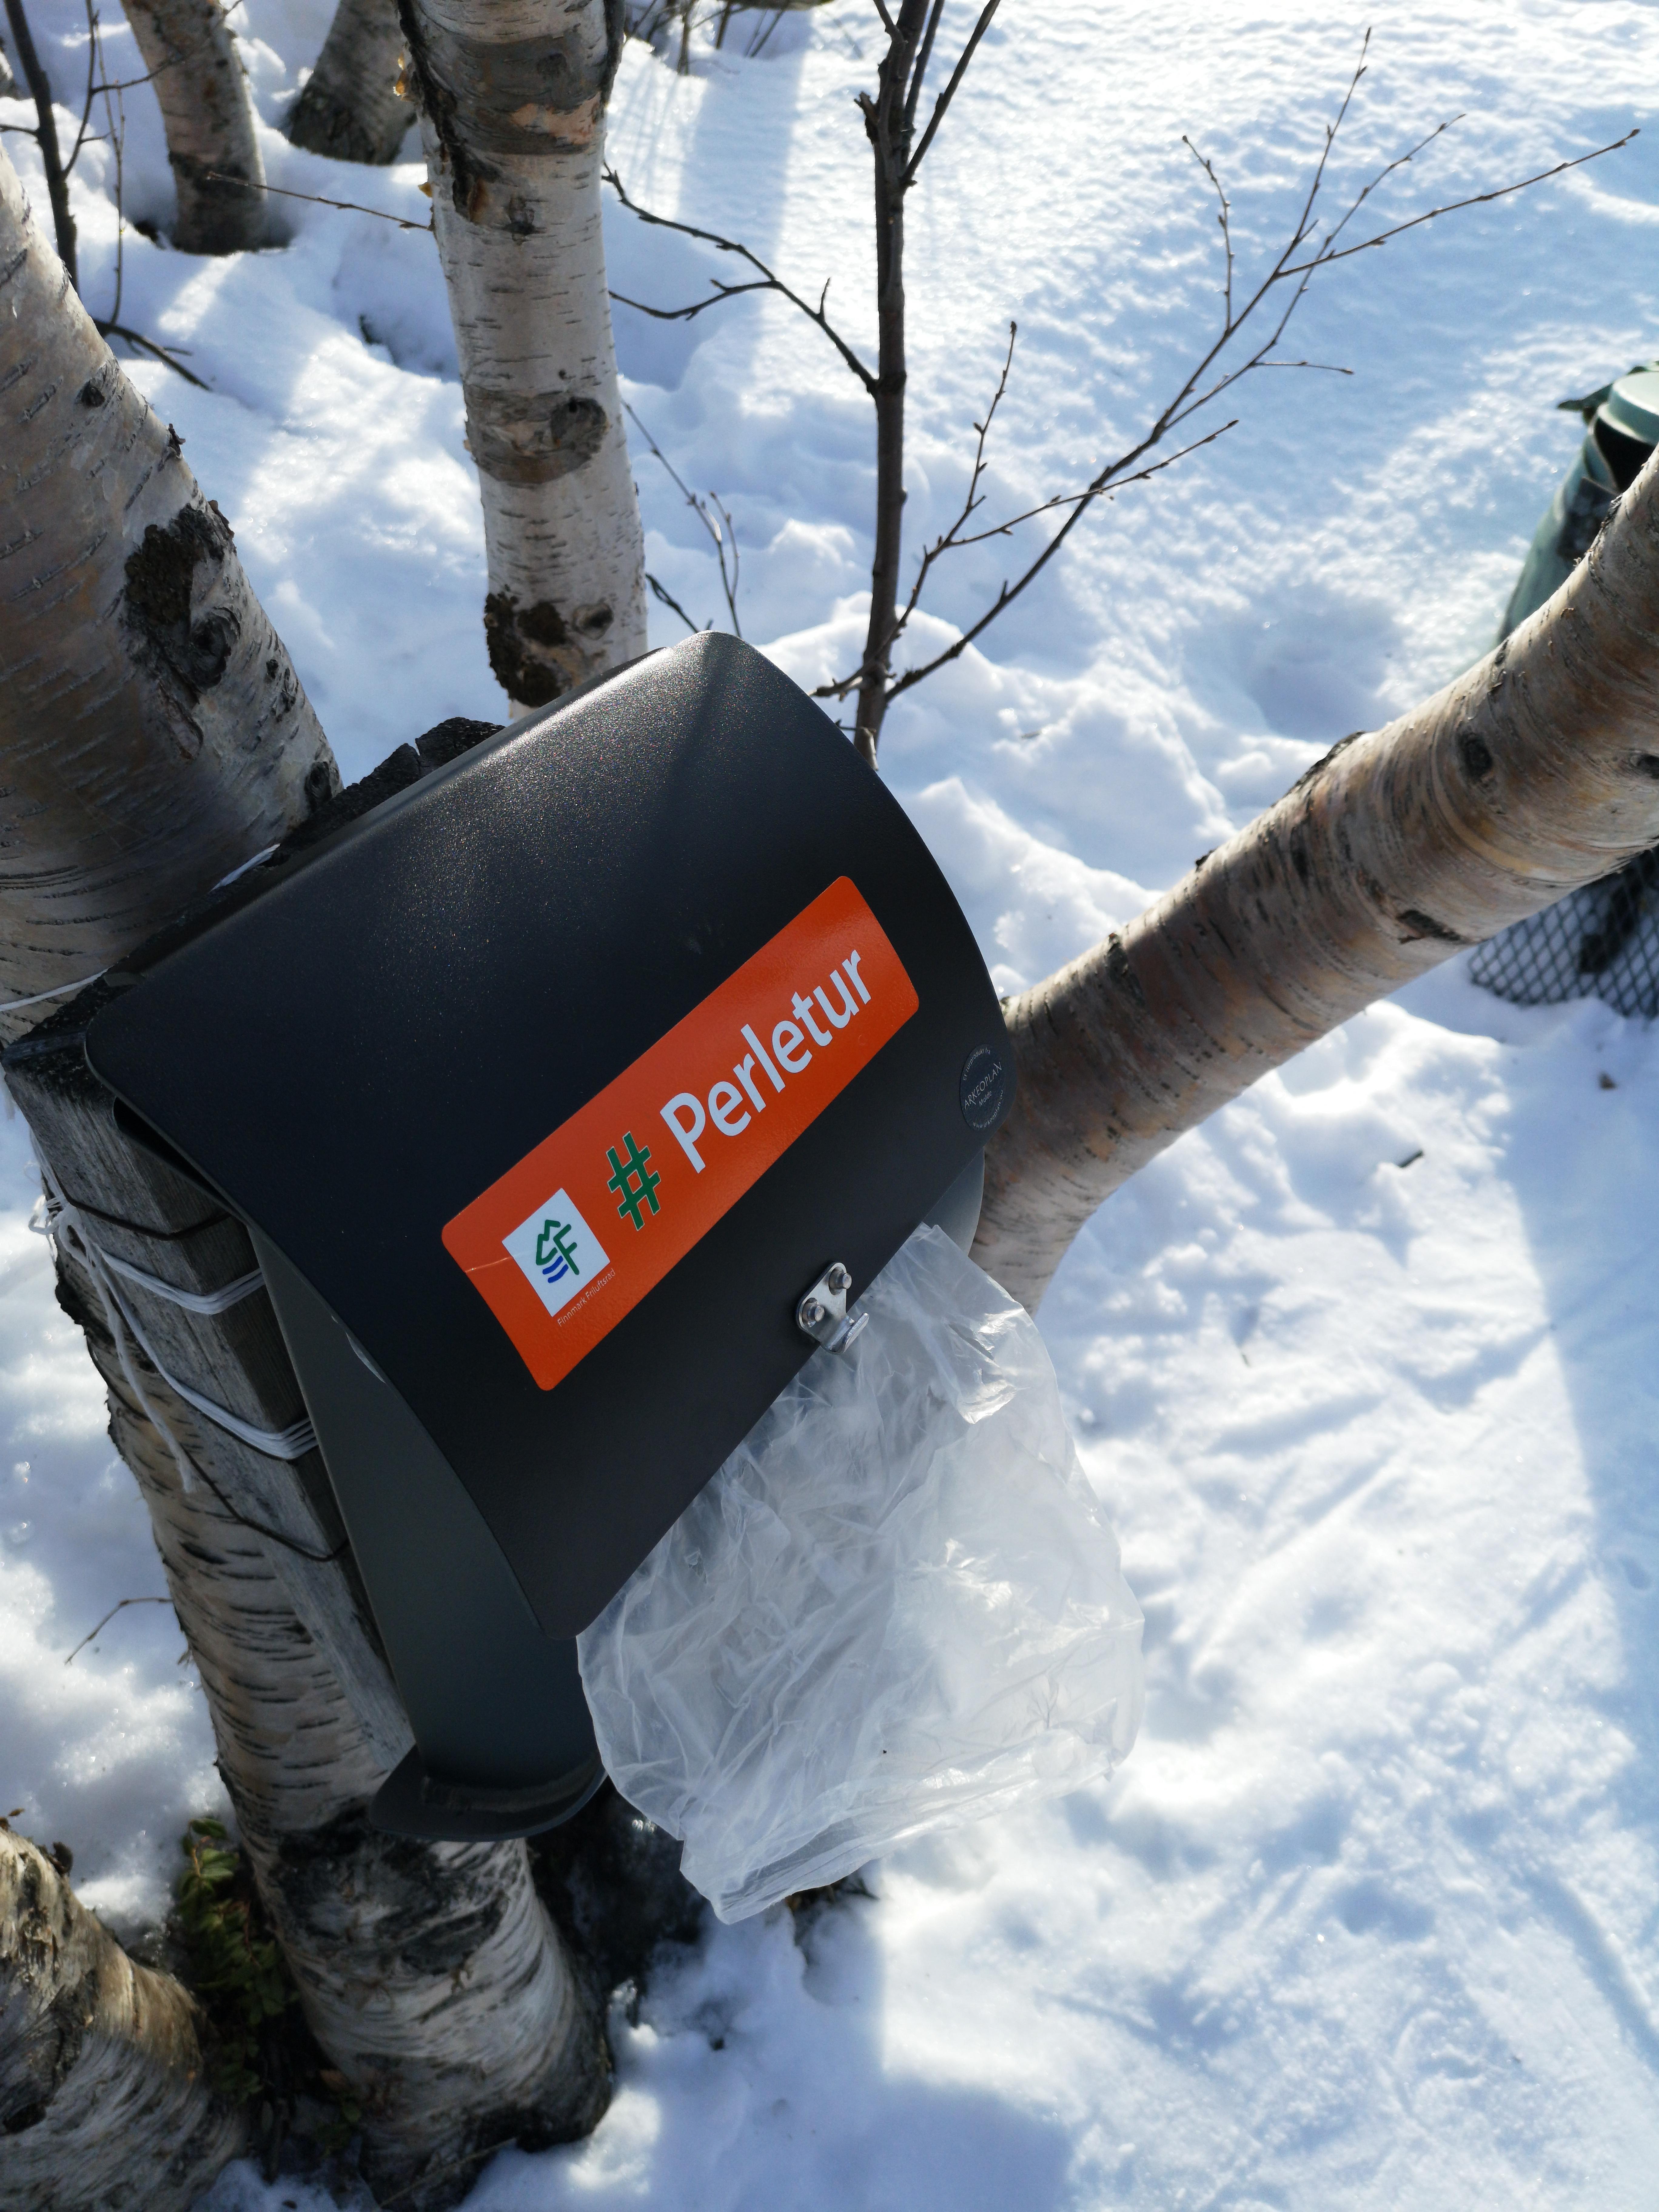 Beskyttet: Skolegruppa har skiskole :)